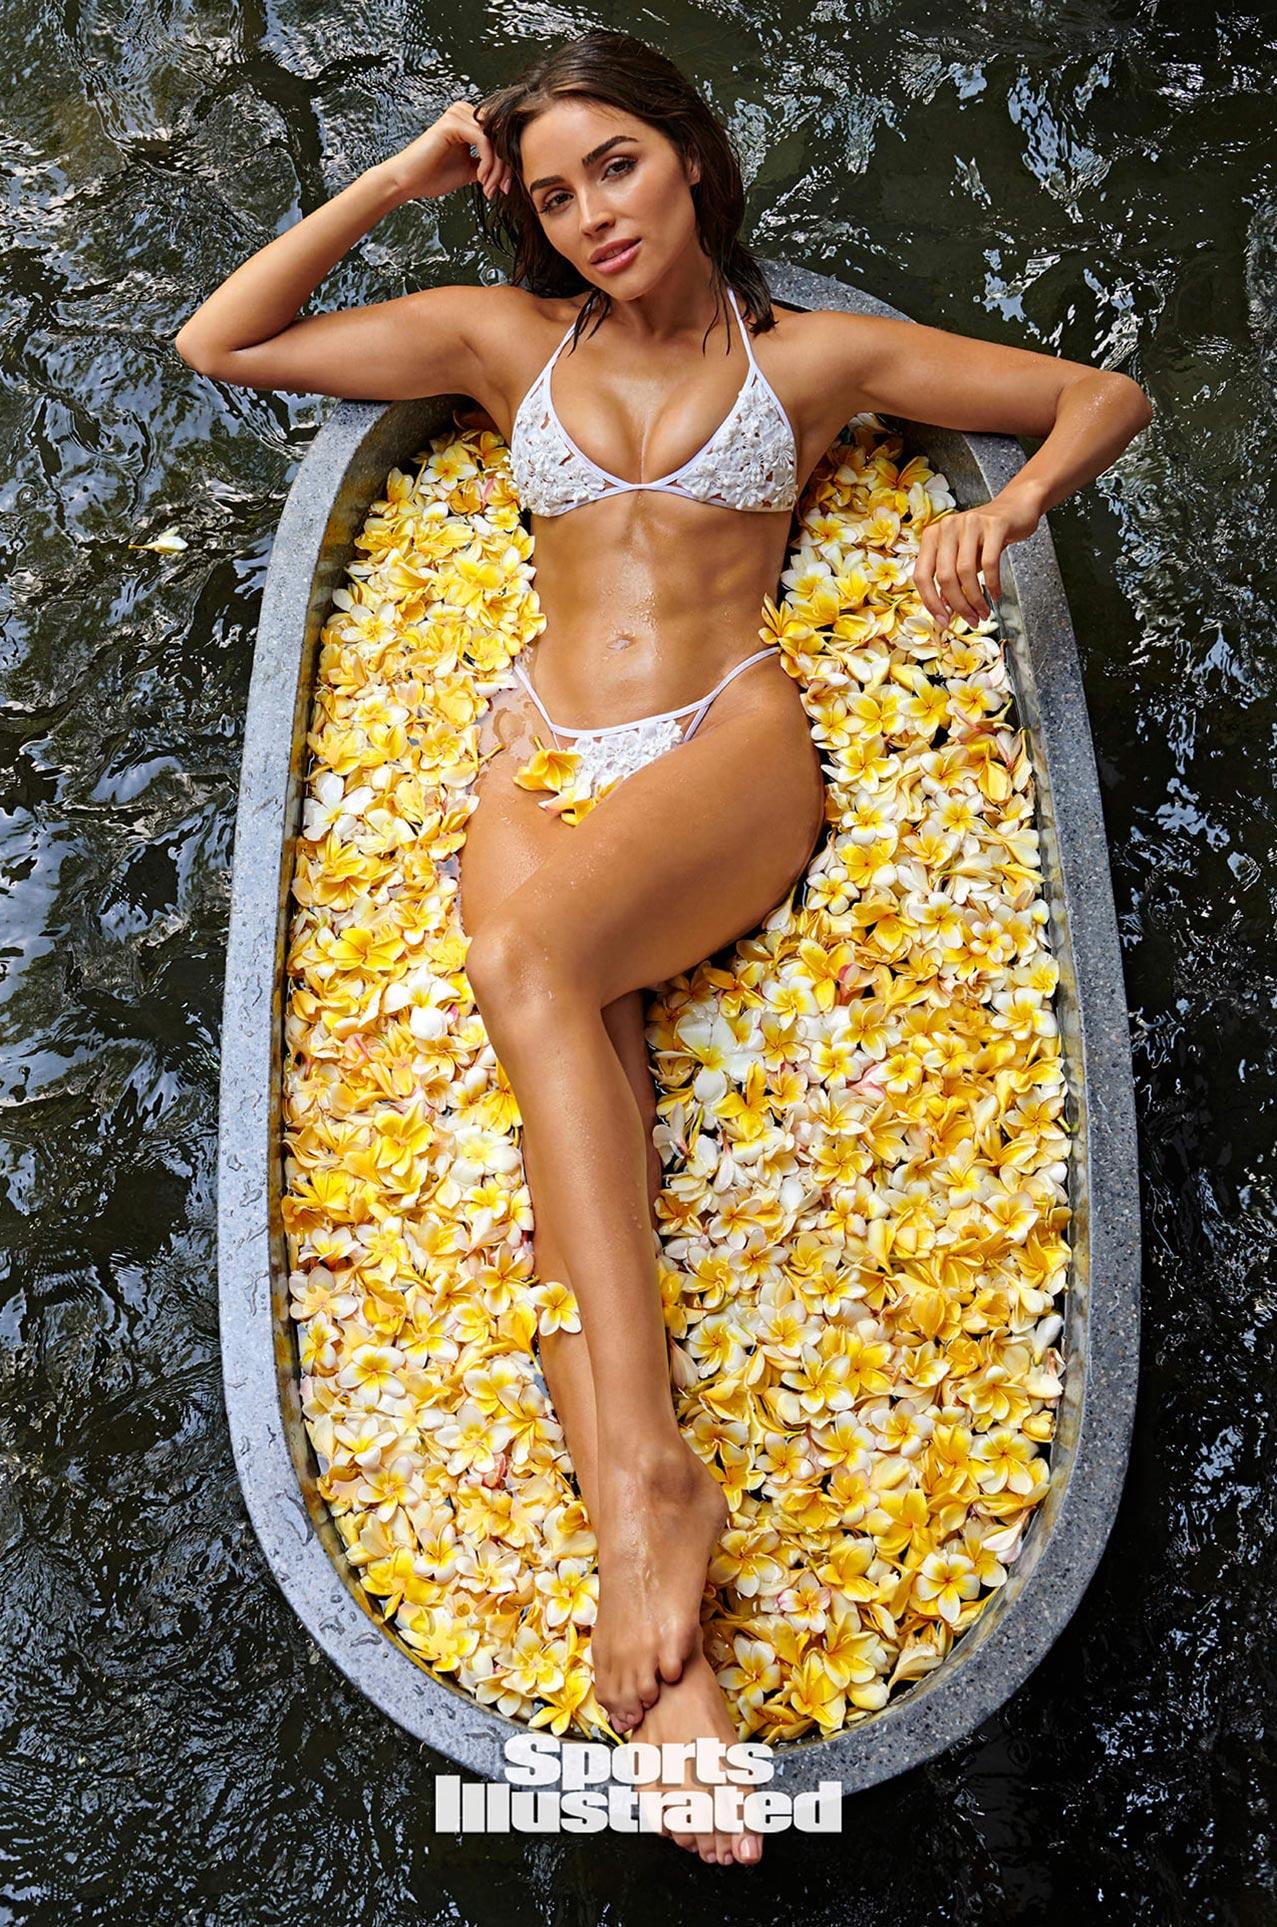 Оливия Калпо в каталоге купальников Sports Illustrated Swimsuit 2020 / фото 05